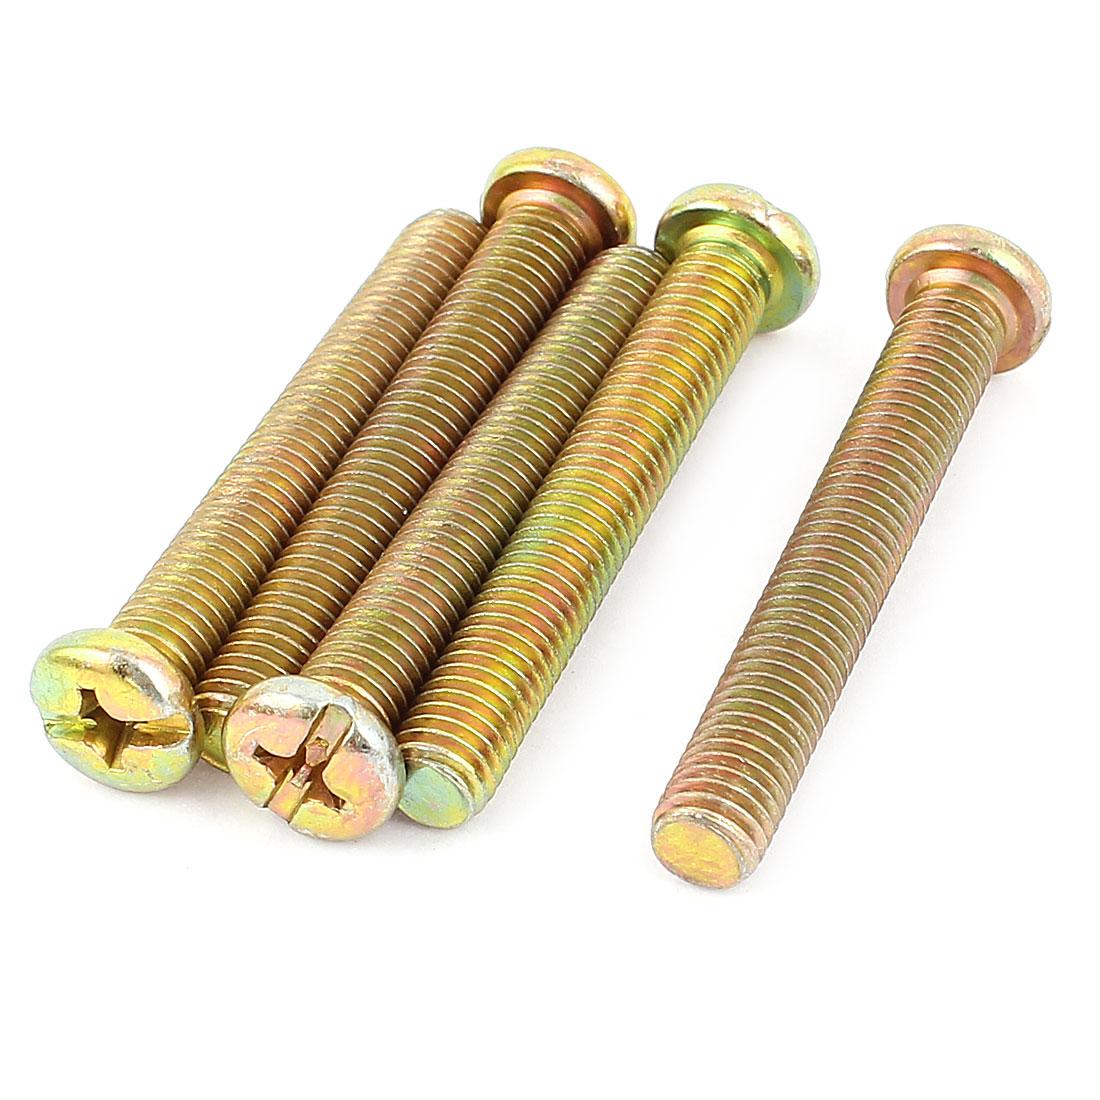 M8 x 55mm Male Thread Phillips Round Head Machine Screw Bolt Bronze Tone 5 Pcs